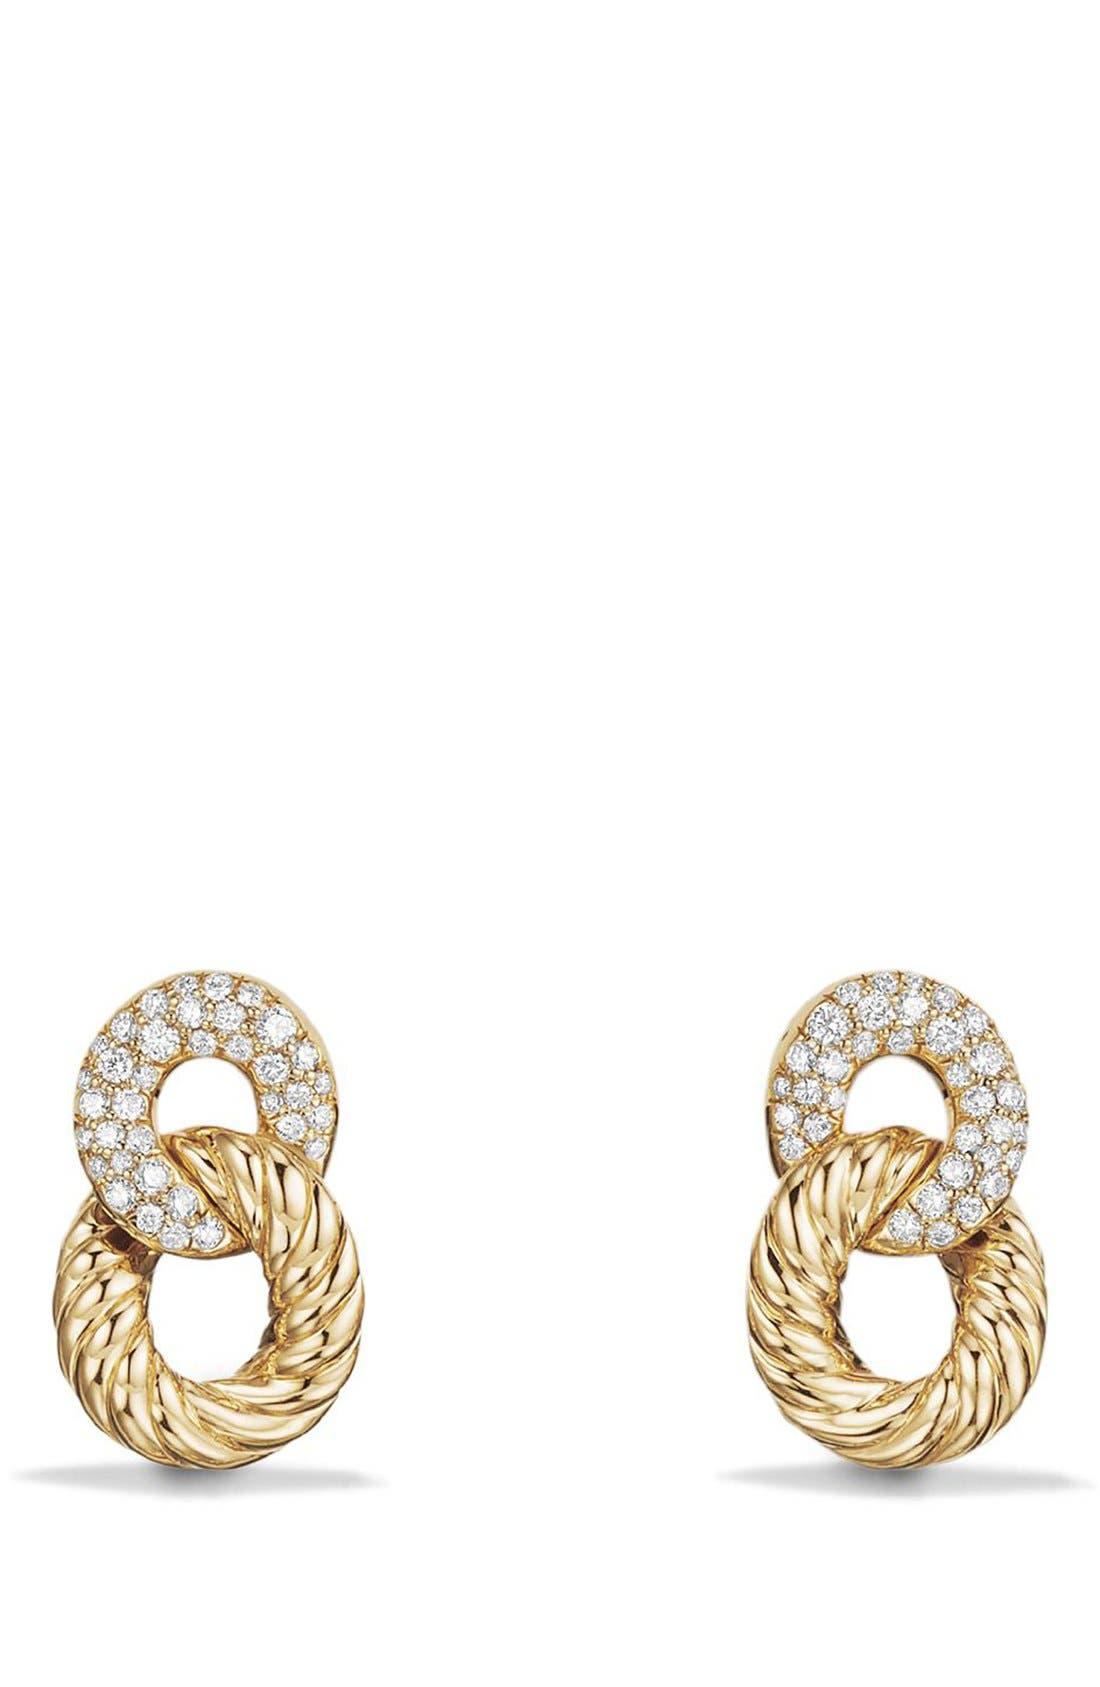 DAVID YURMAN,                             Extra-Small Curb Link Drop Earrings with Diamond in 18K Gold,                             Main thumbnail 1, color,                             YELLOW GOLD/ DIAMOND